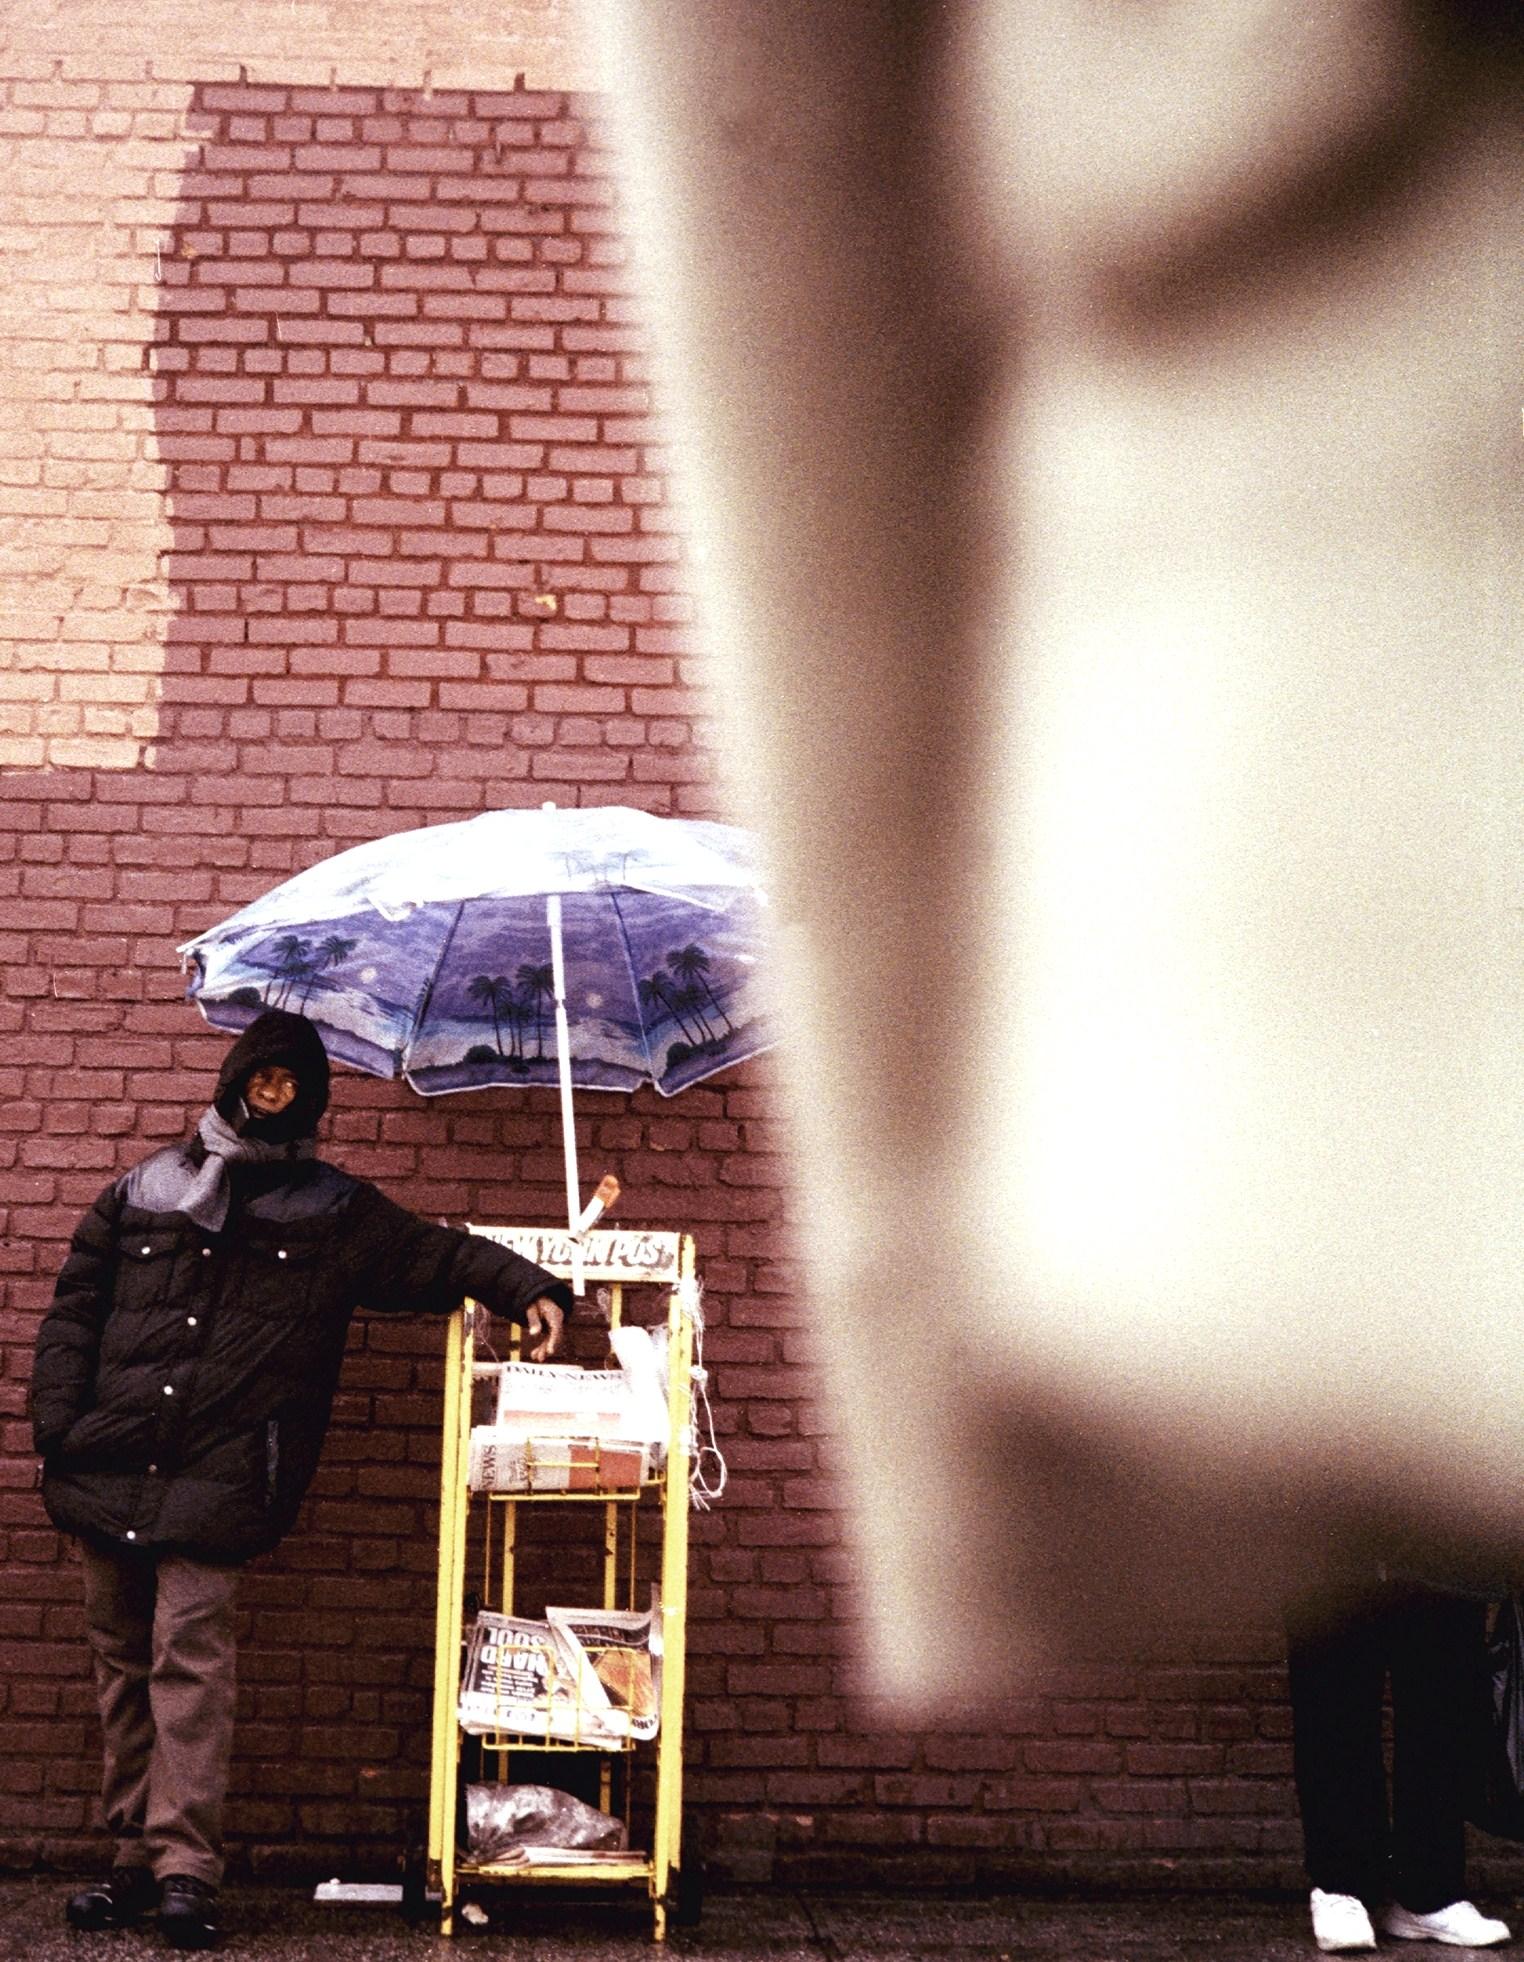 Newspaper vendor. Brooklyn, New York. Photographed on 135 film (35mm). Minolta Hi-Matic